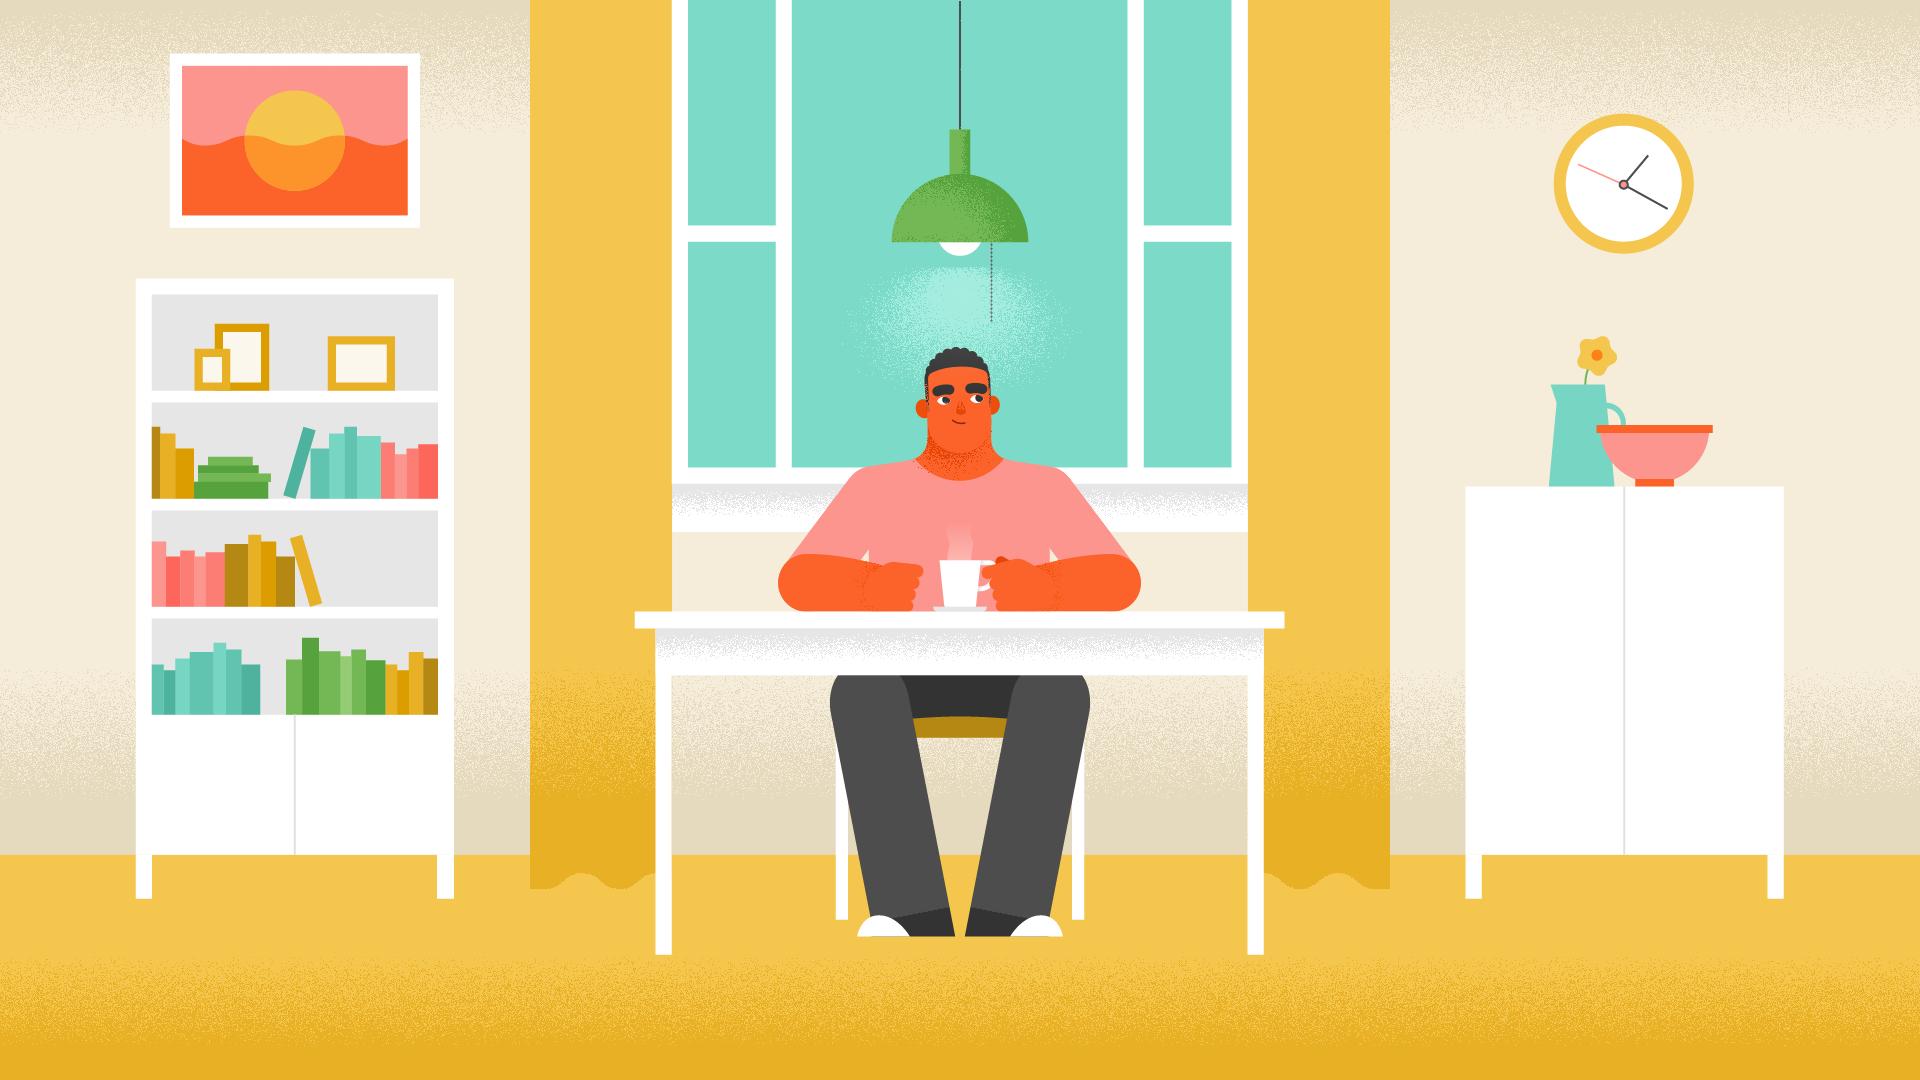 man looks around dining room, smiling